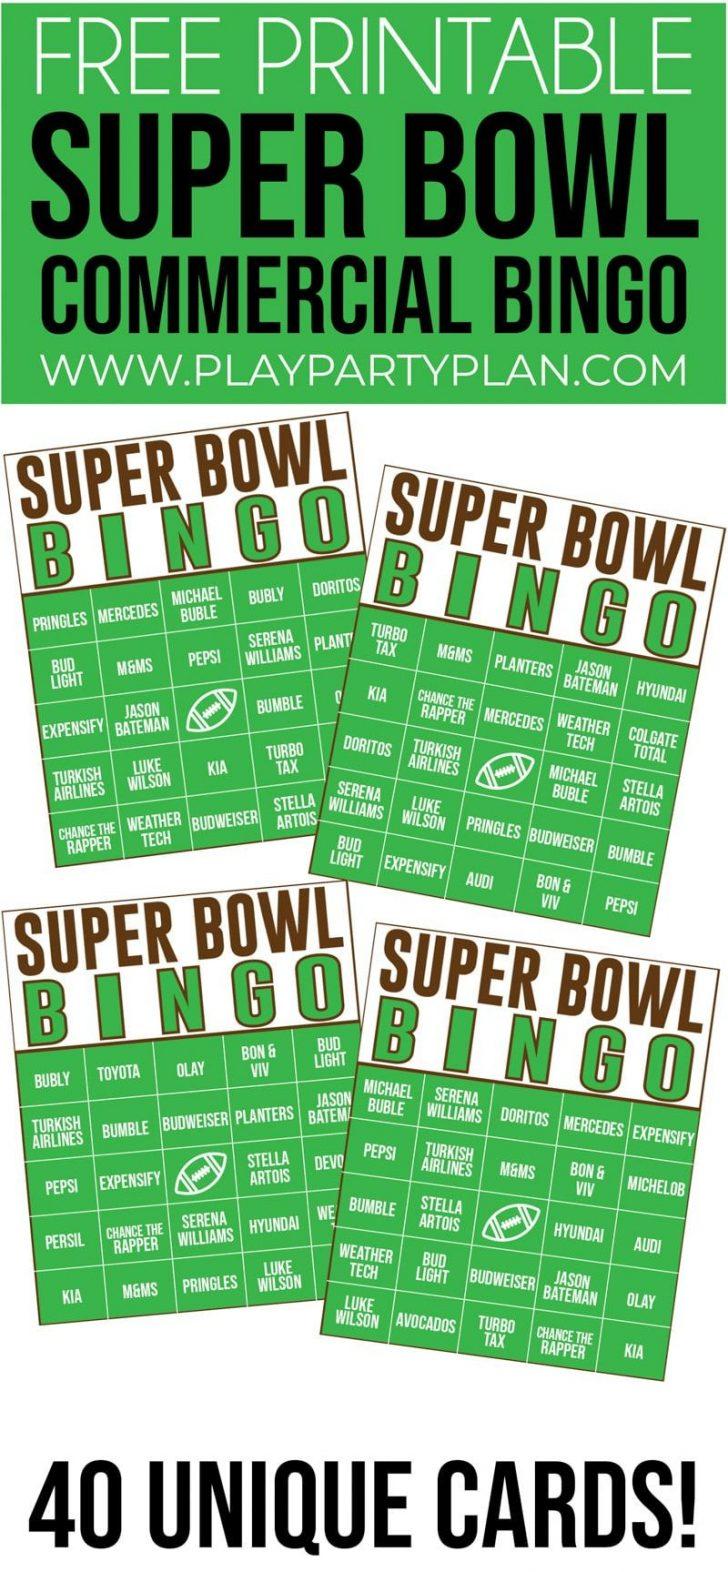 Super Bowl Commercial Bingo Cards Printable